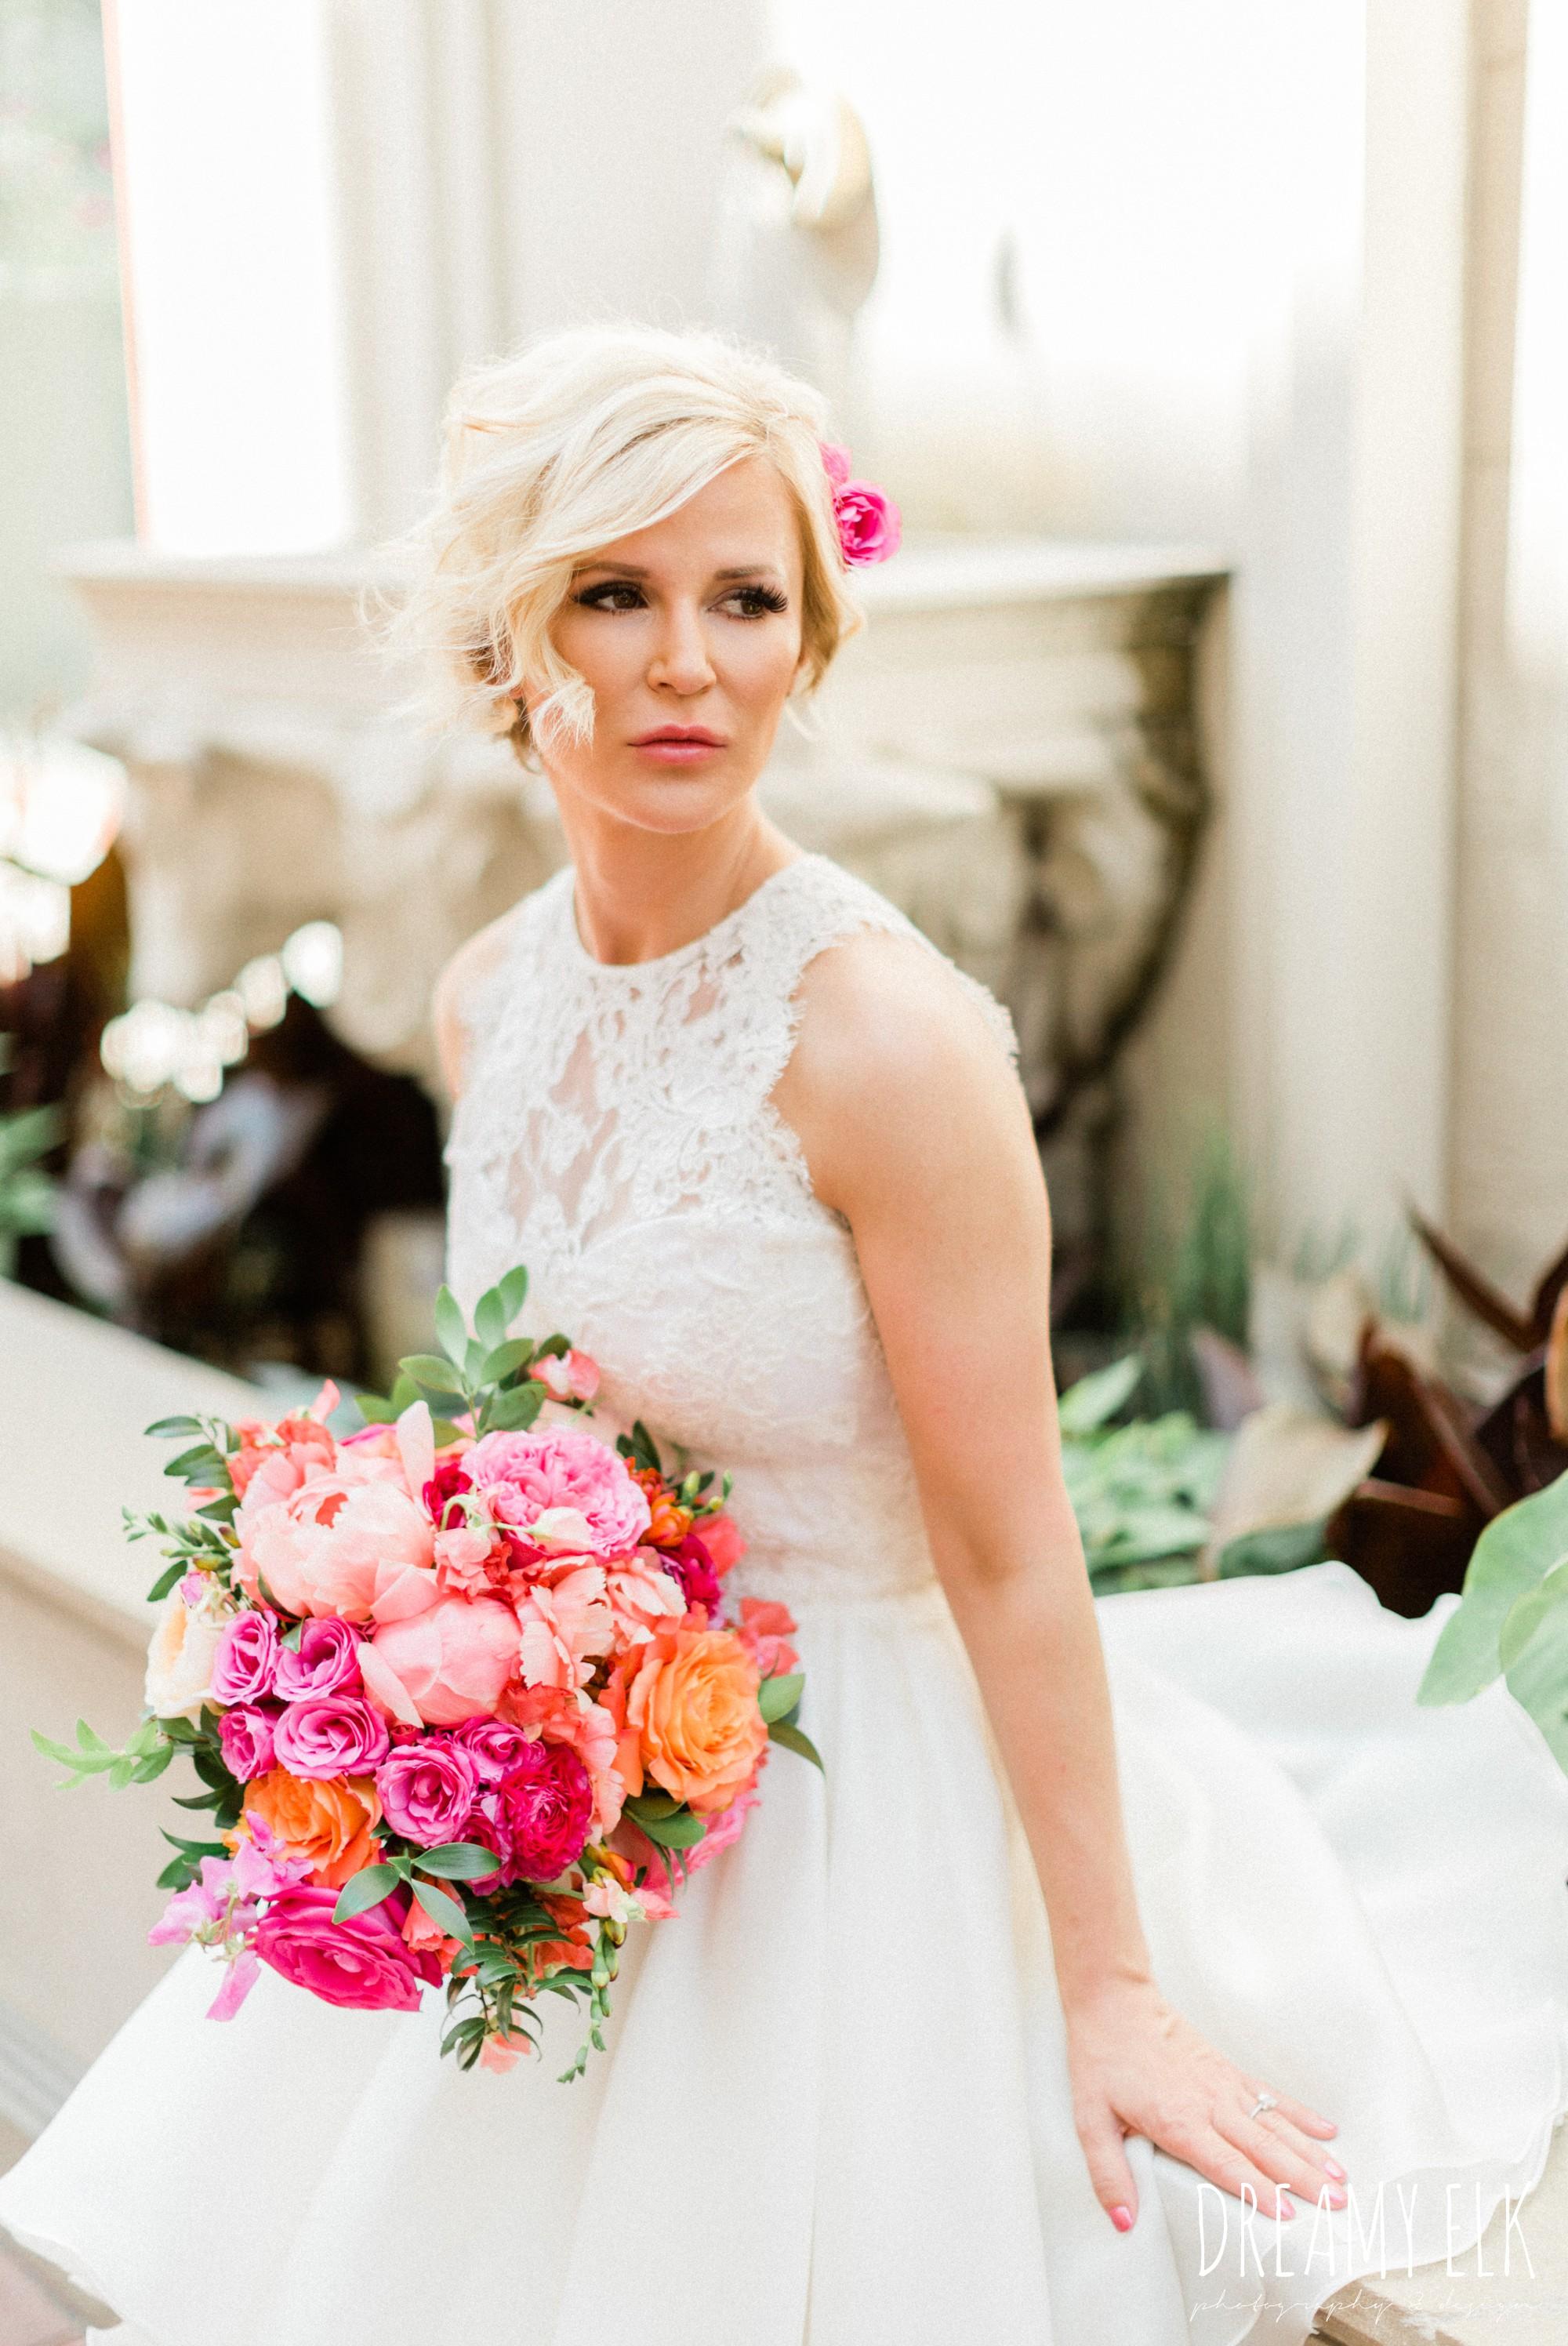 bride, michael faircloth, short wedding dress, spring colorful pink orange wedding photo, fort worth, texas, dreamy elk photography and design, jen rios weddings, kate foley designs